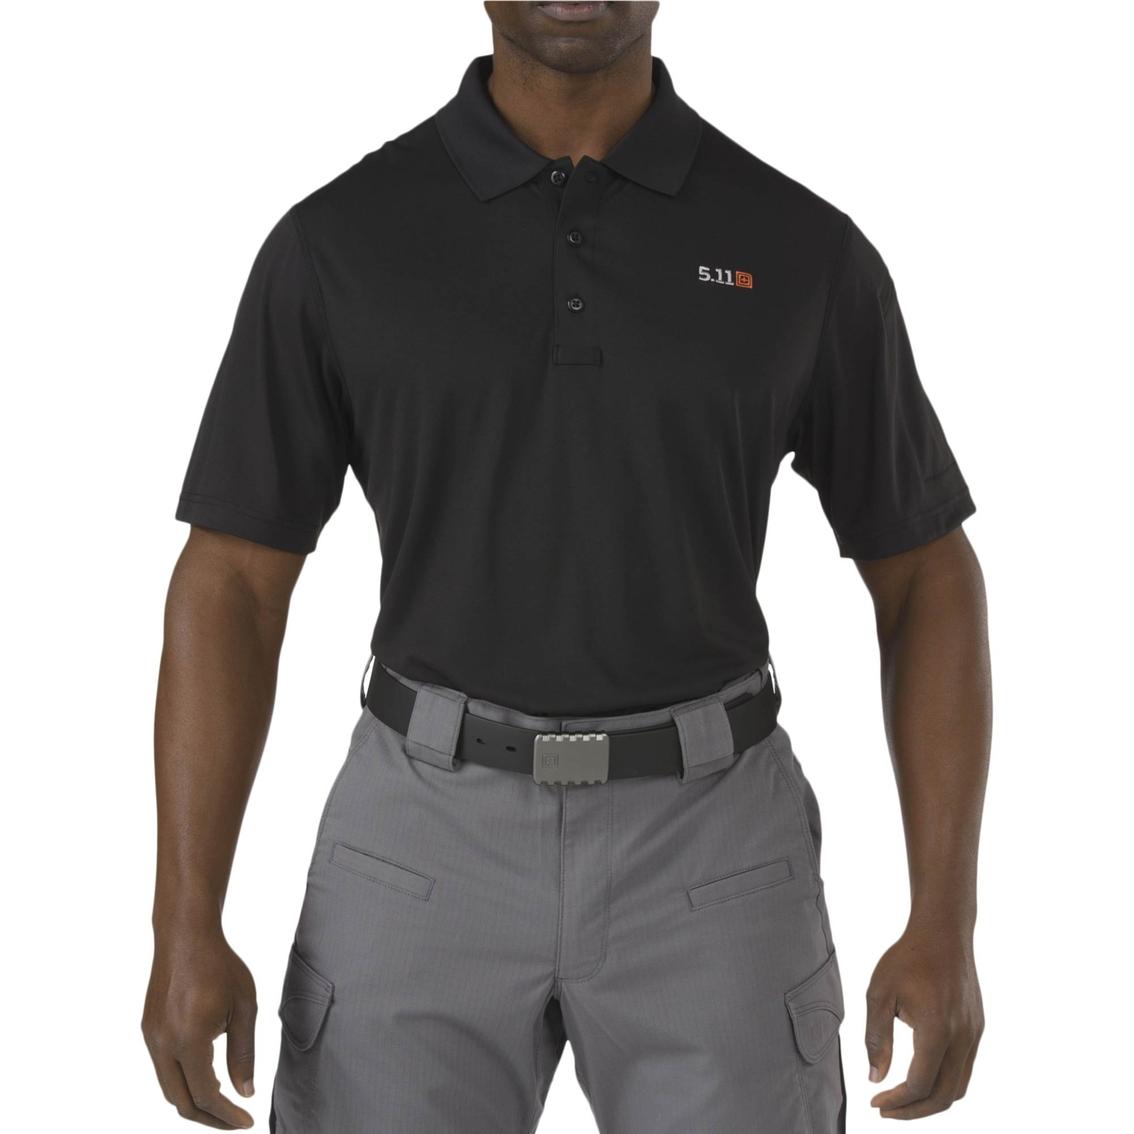 5.11 Tactical Pinnacle Polo Shirt X Large Black J4pT4K9U